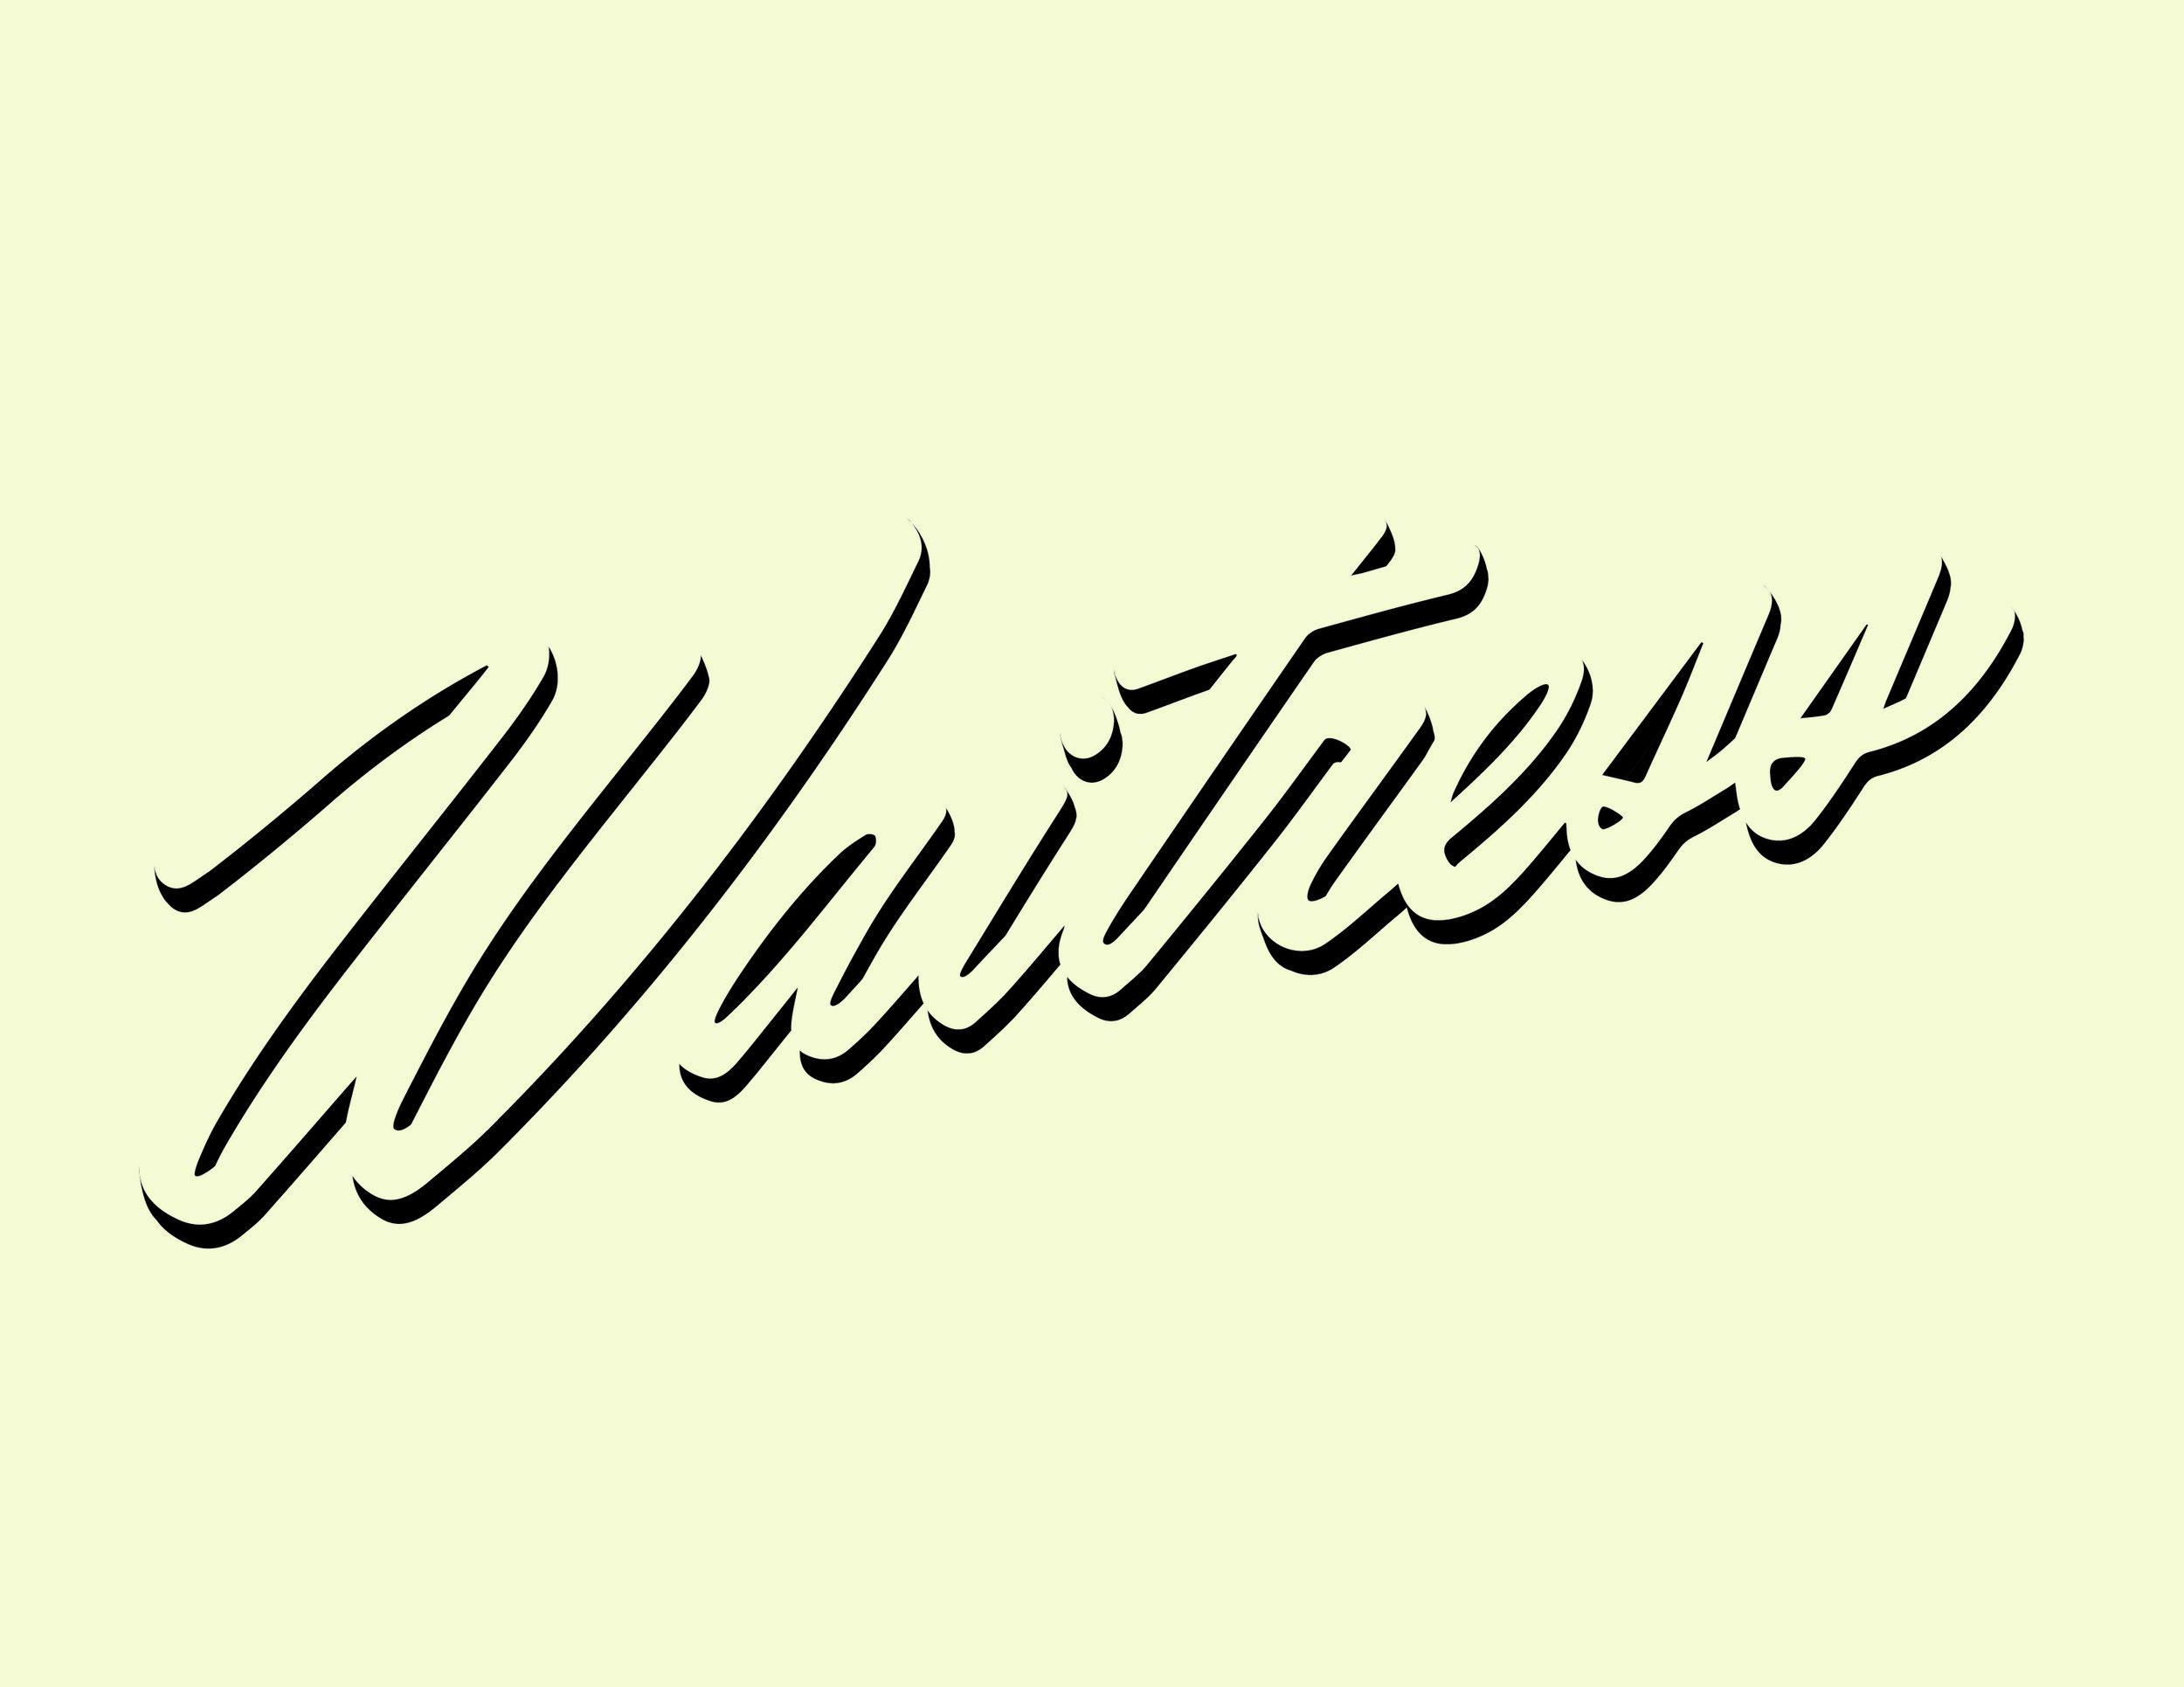 waitress logos-02.jpg